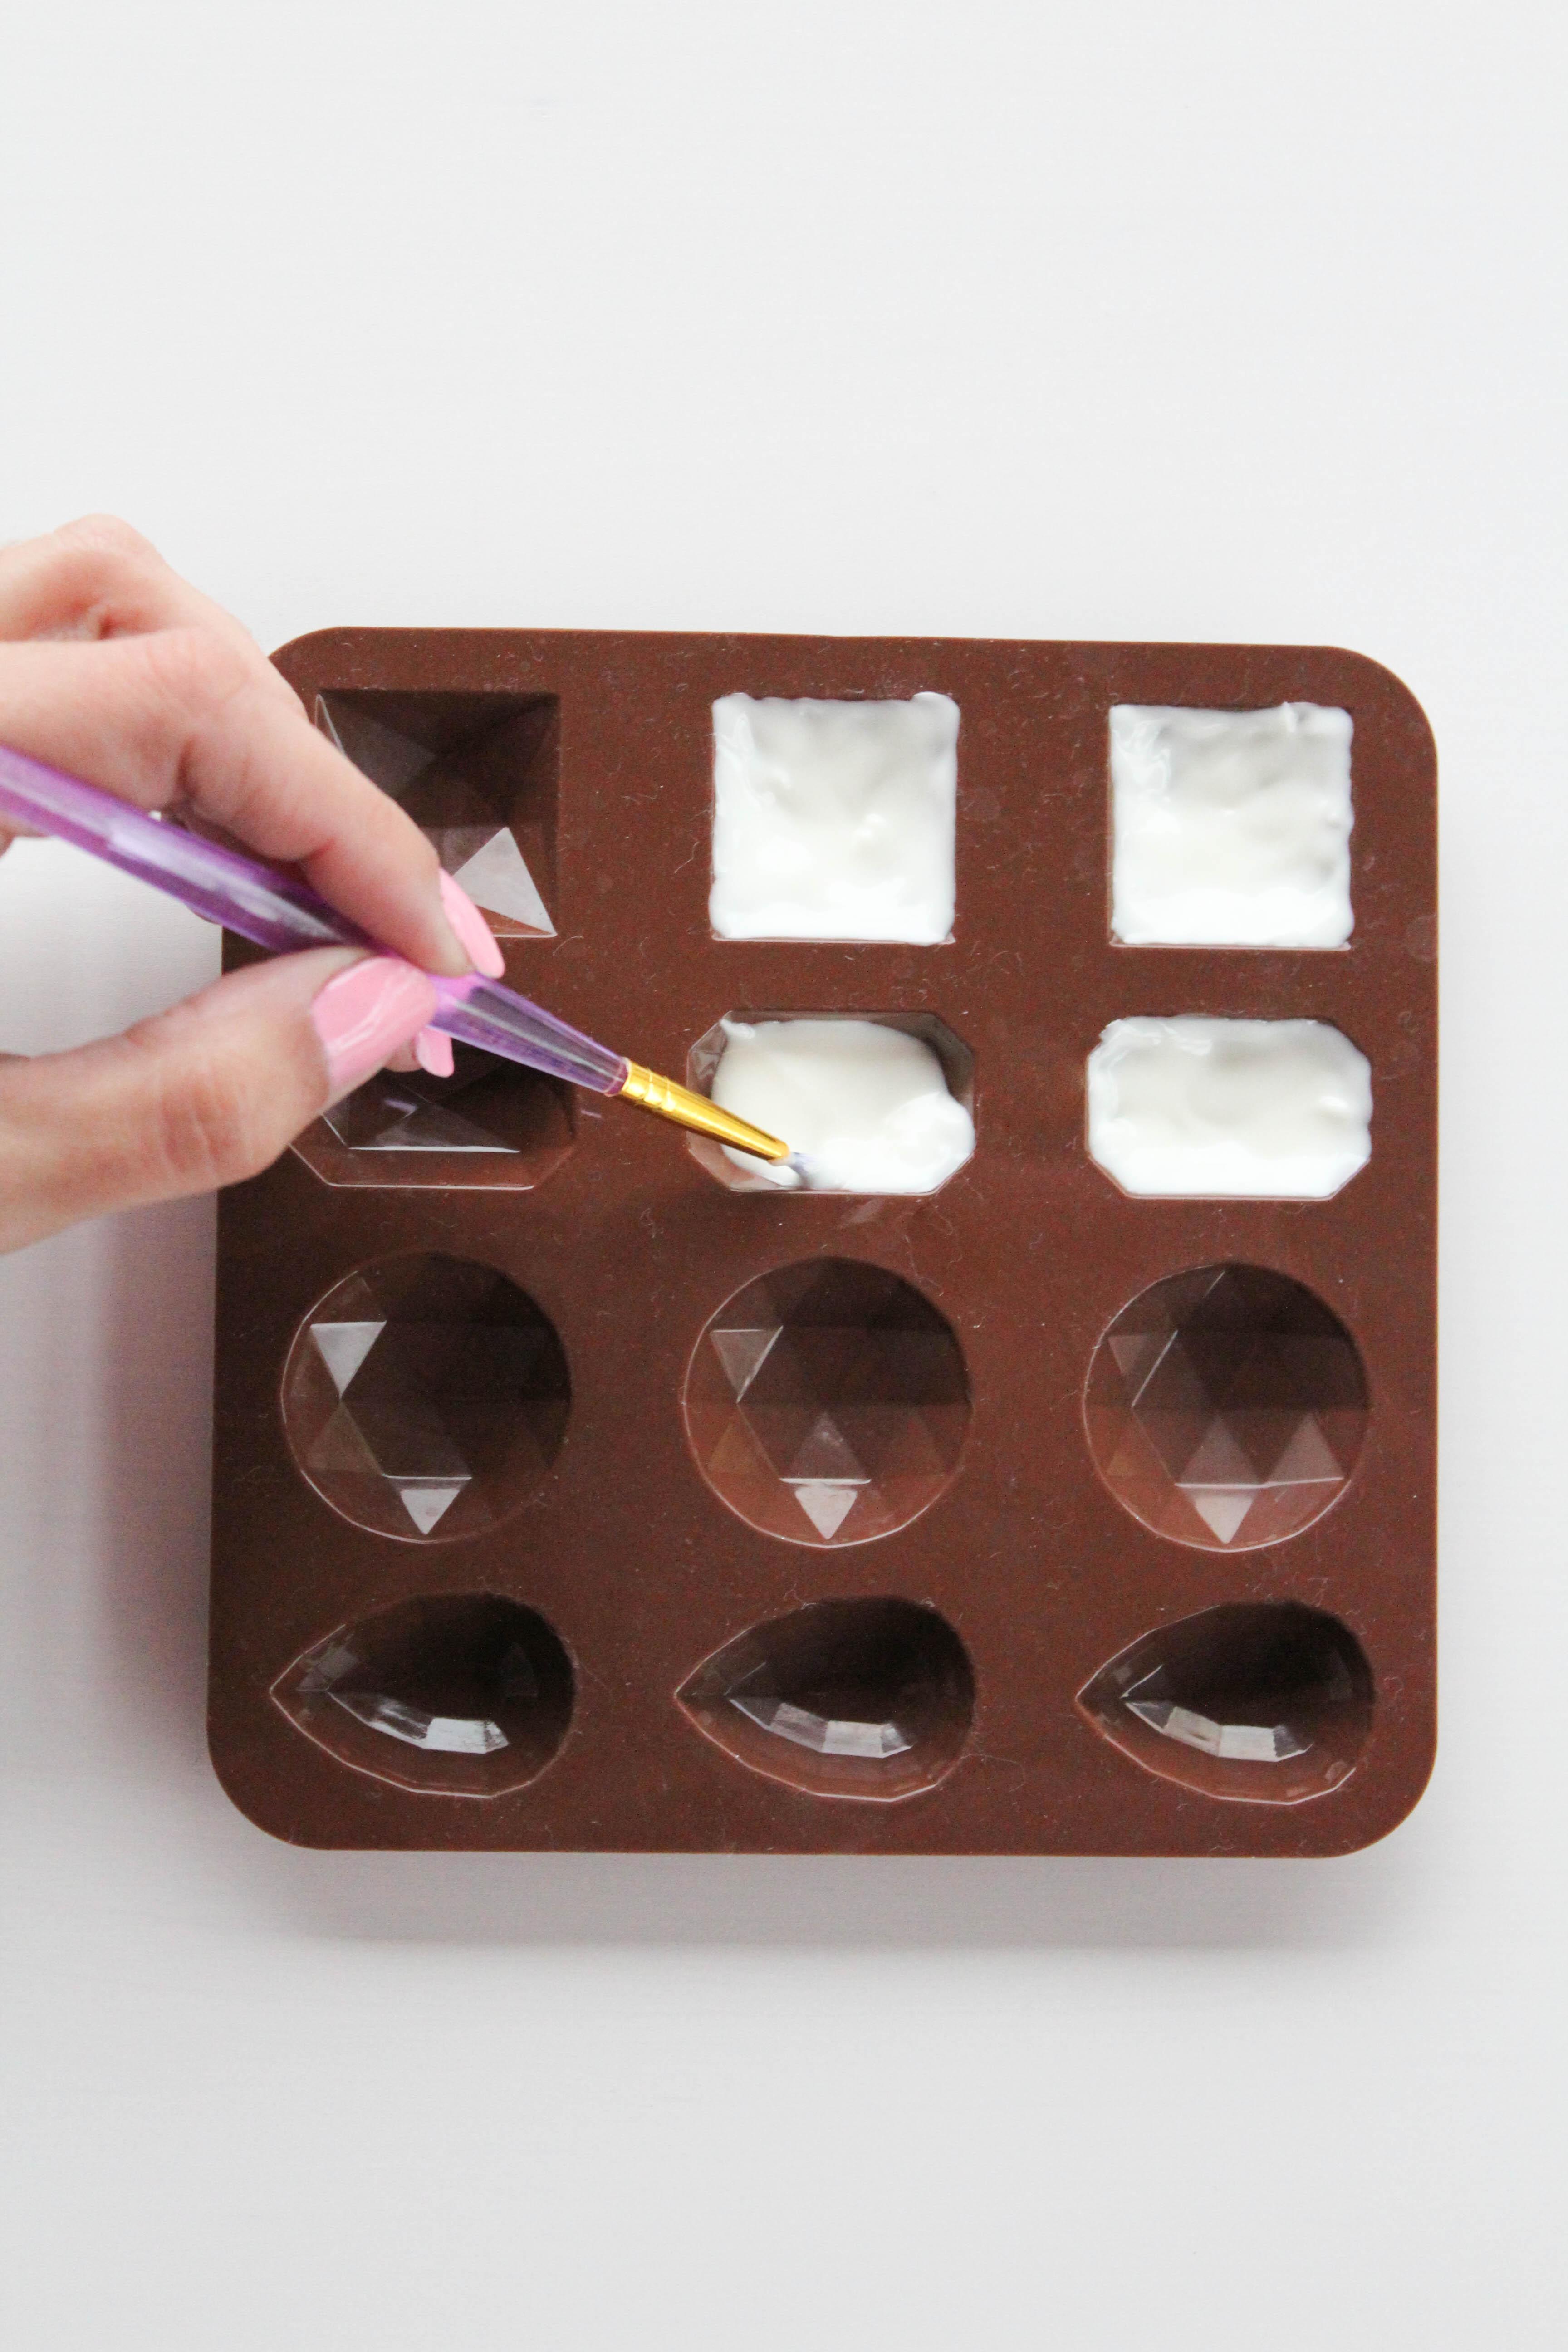 DIY Chocolate Gems - Let's Mingle Blog